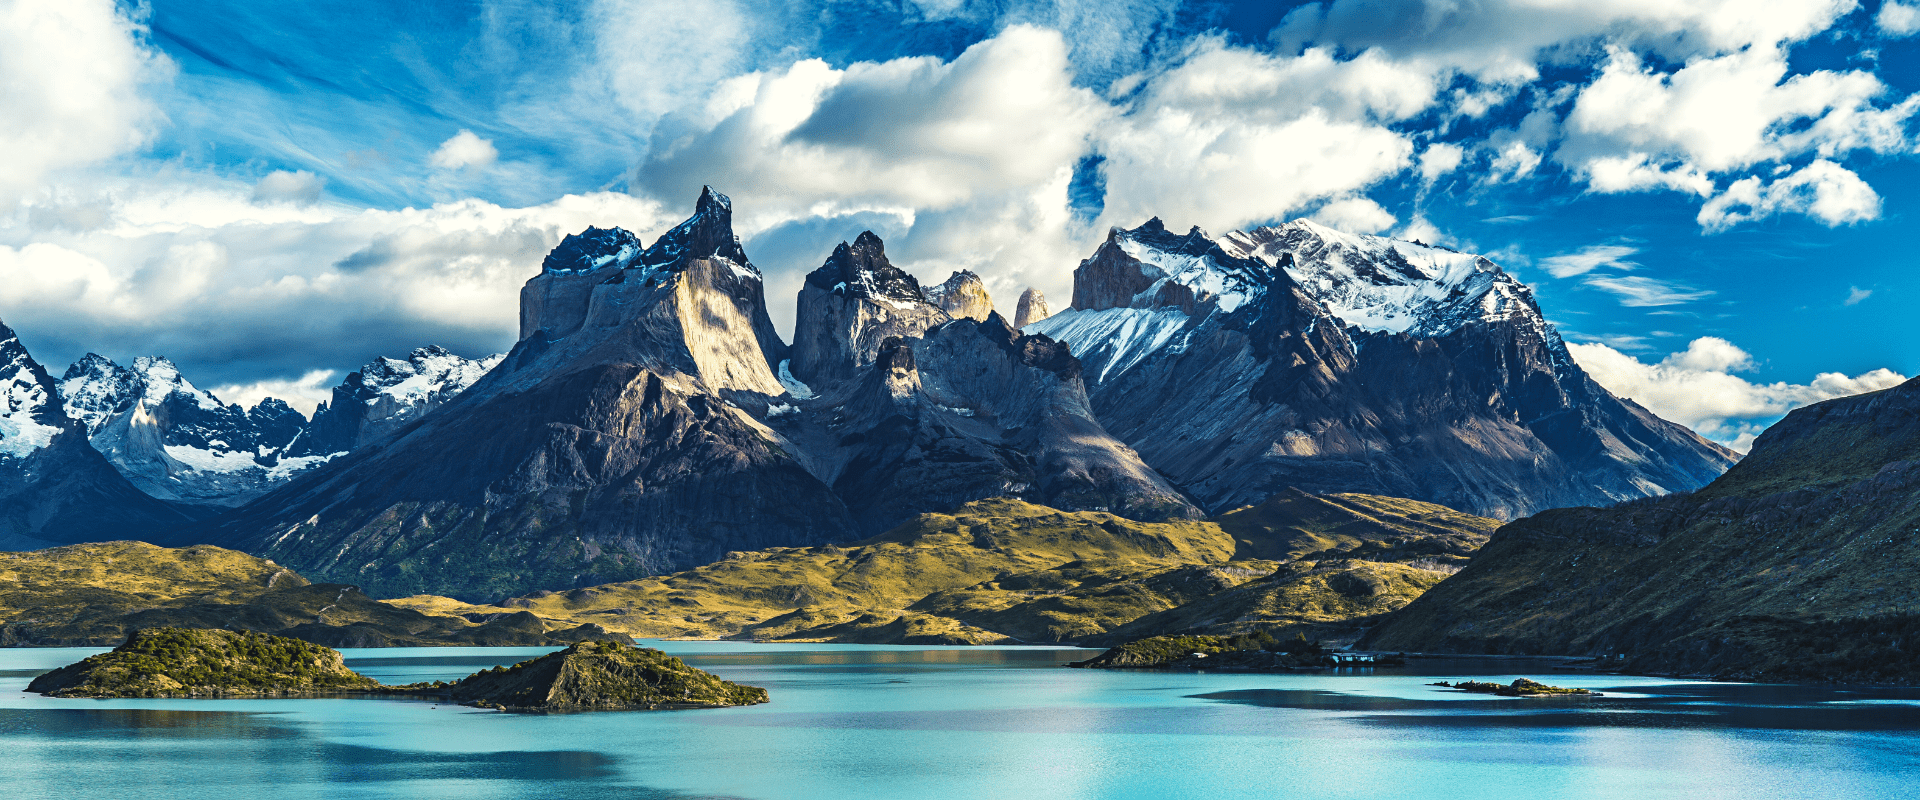 Beautiful Argentina Patagonia Tour